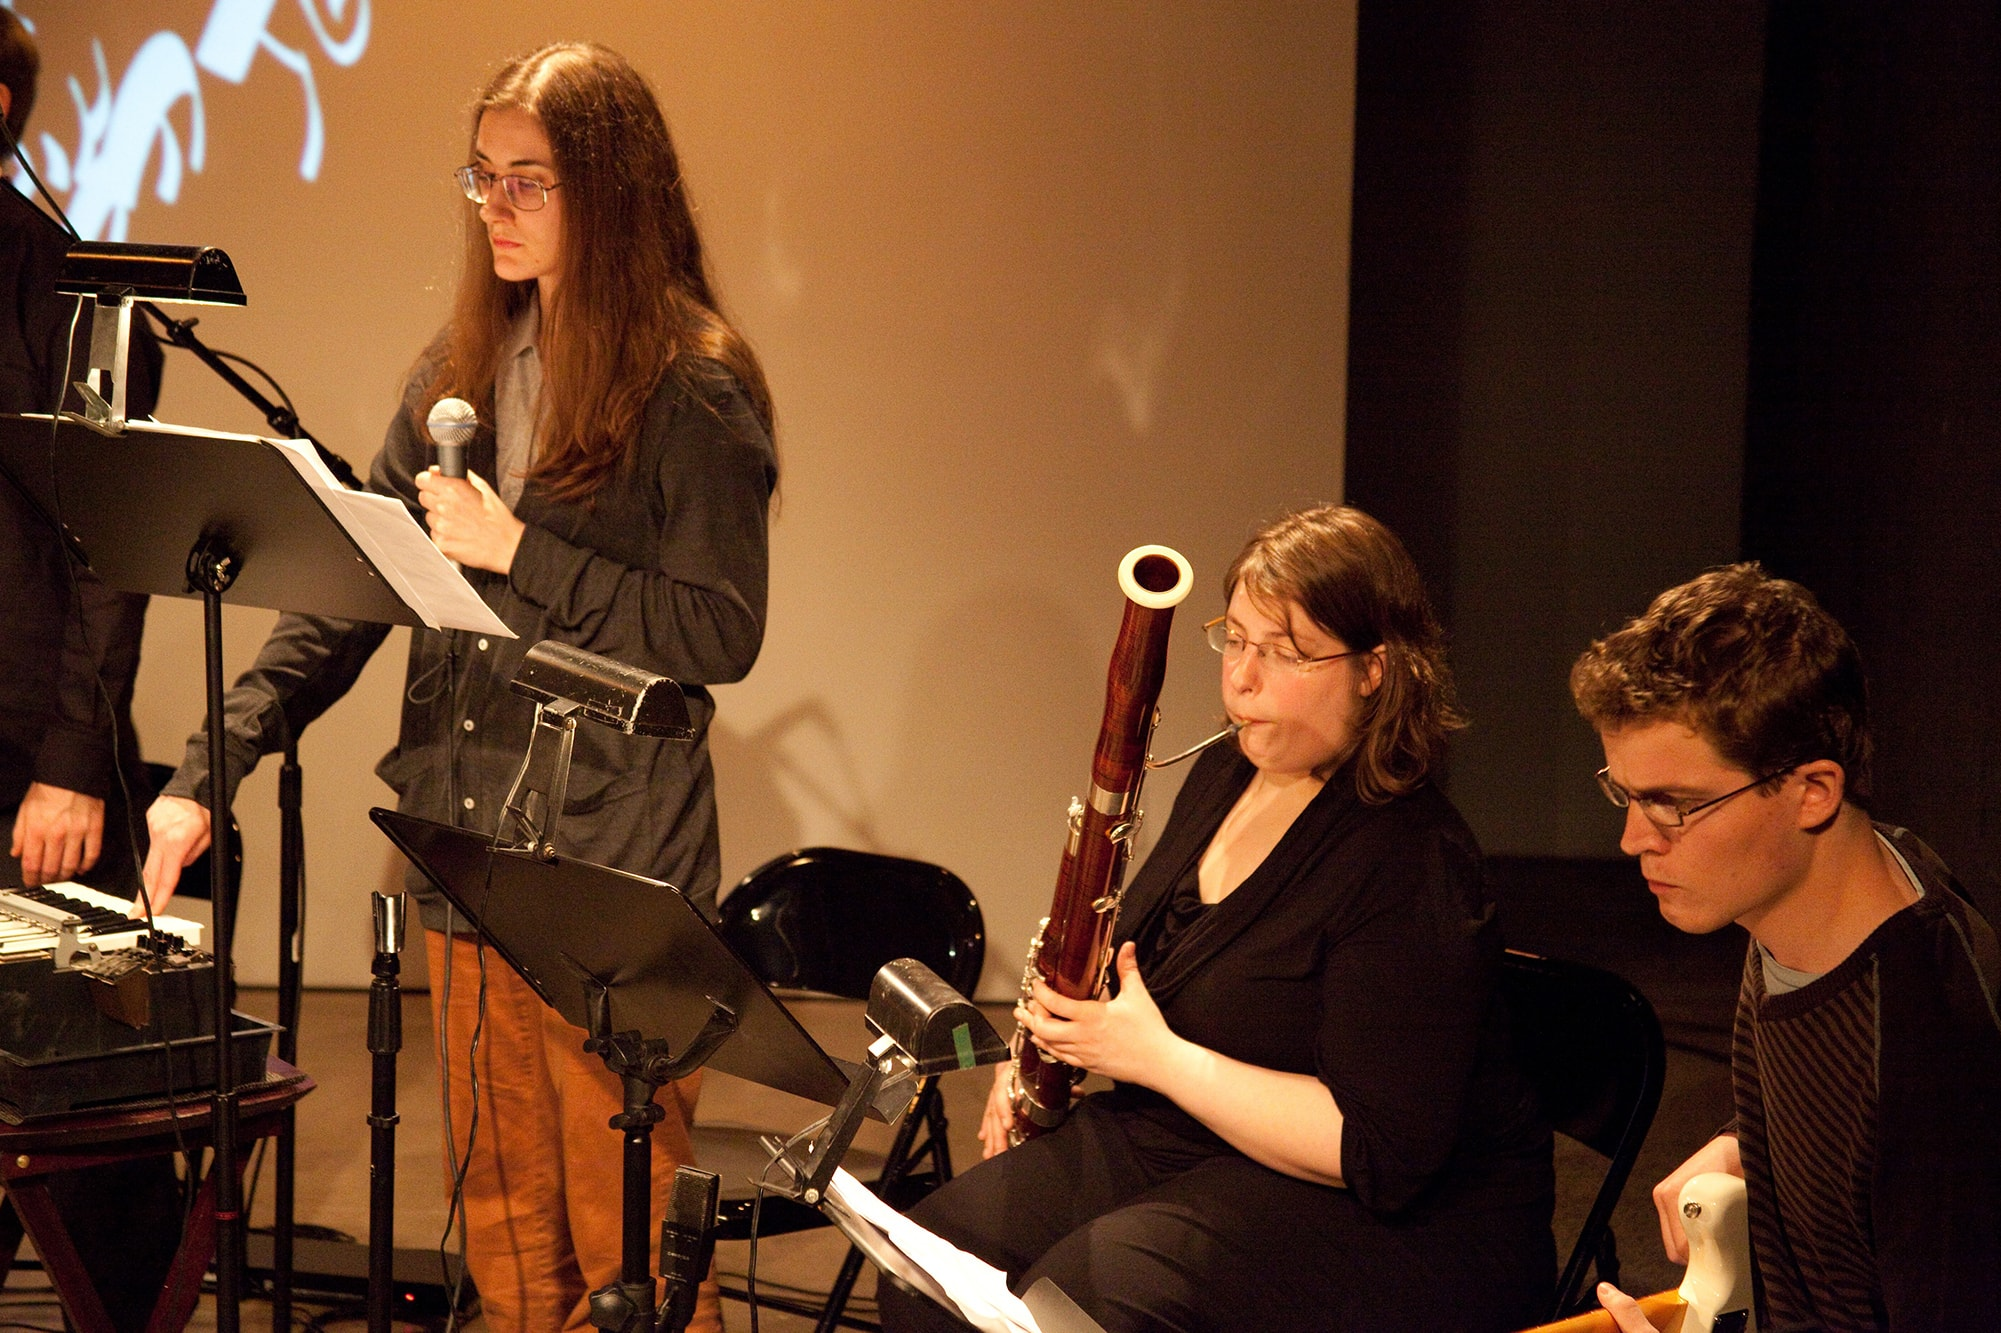 Megan Schubert, Annie Lyle, and Kobe Van Cauwenberghe performing Randy Gibson's <em>Doleo Æternus</em>